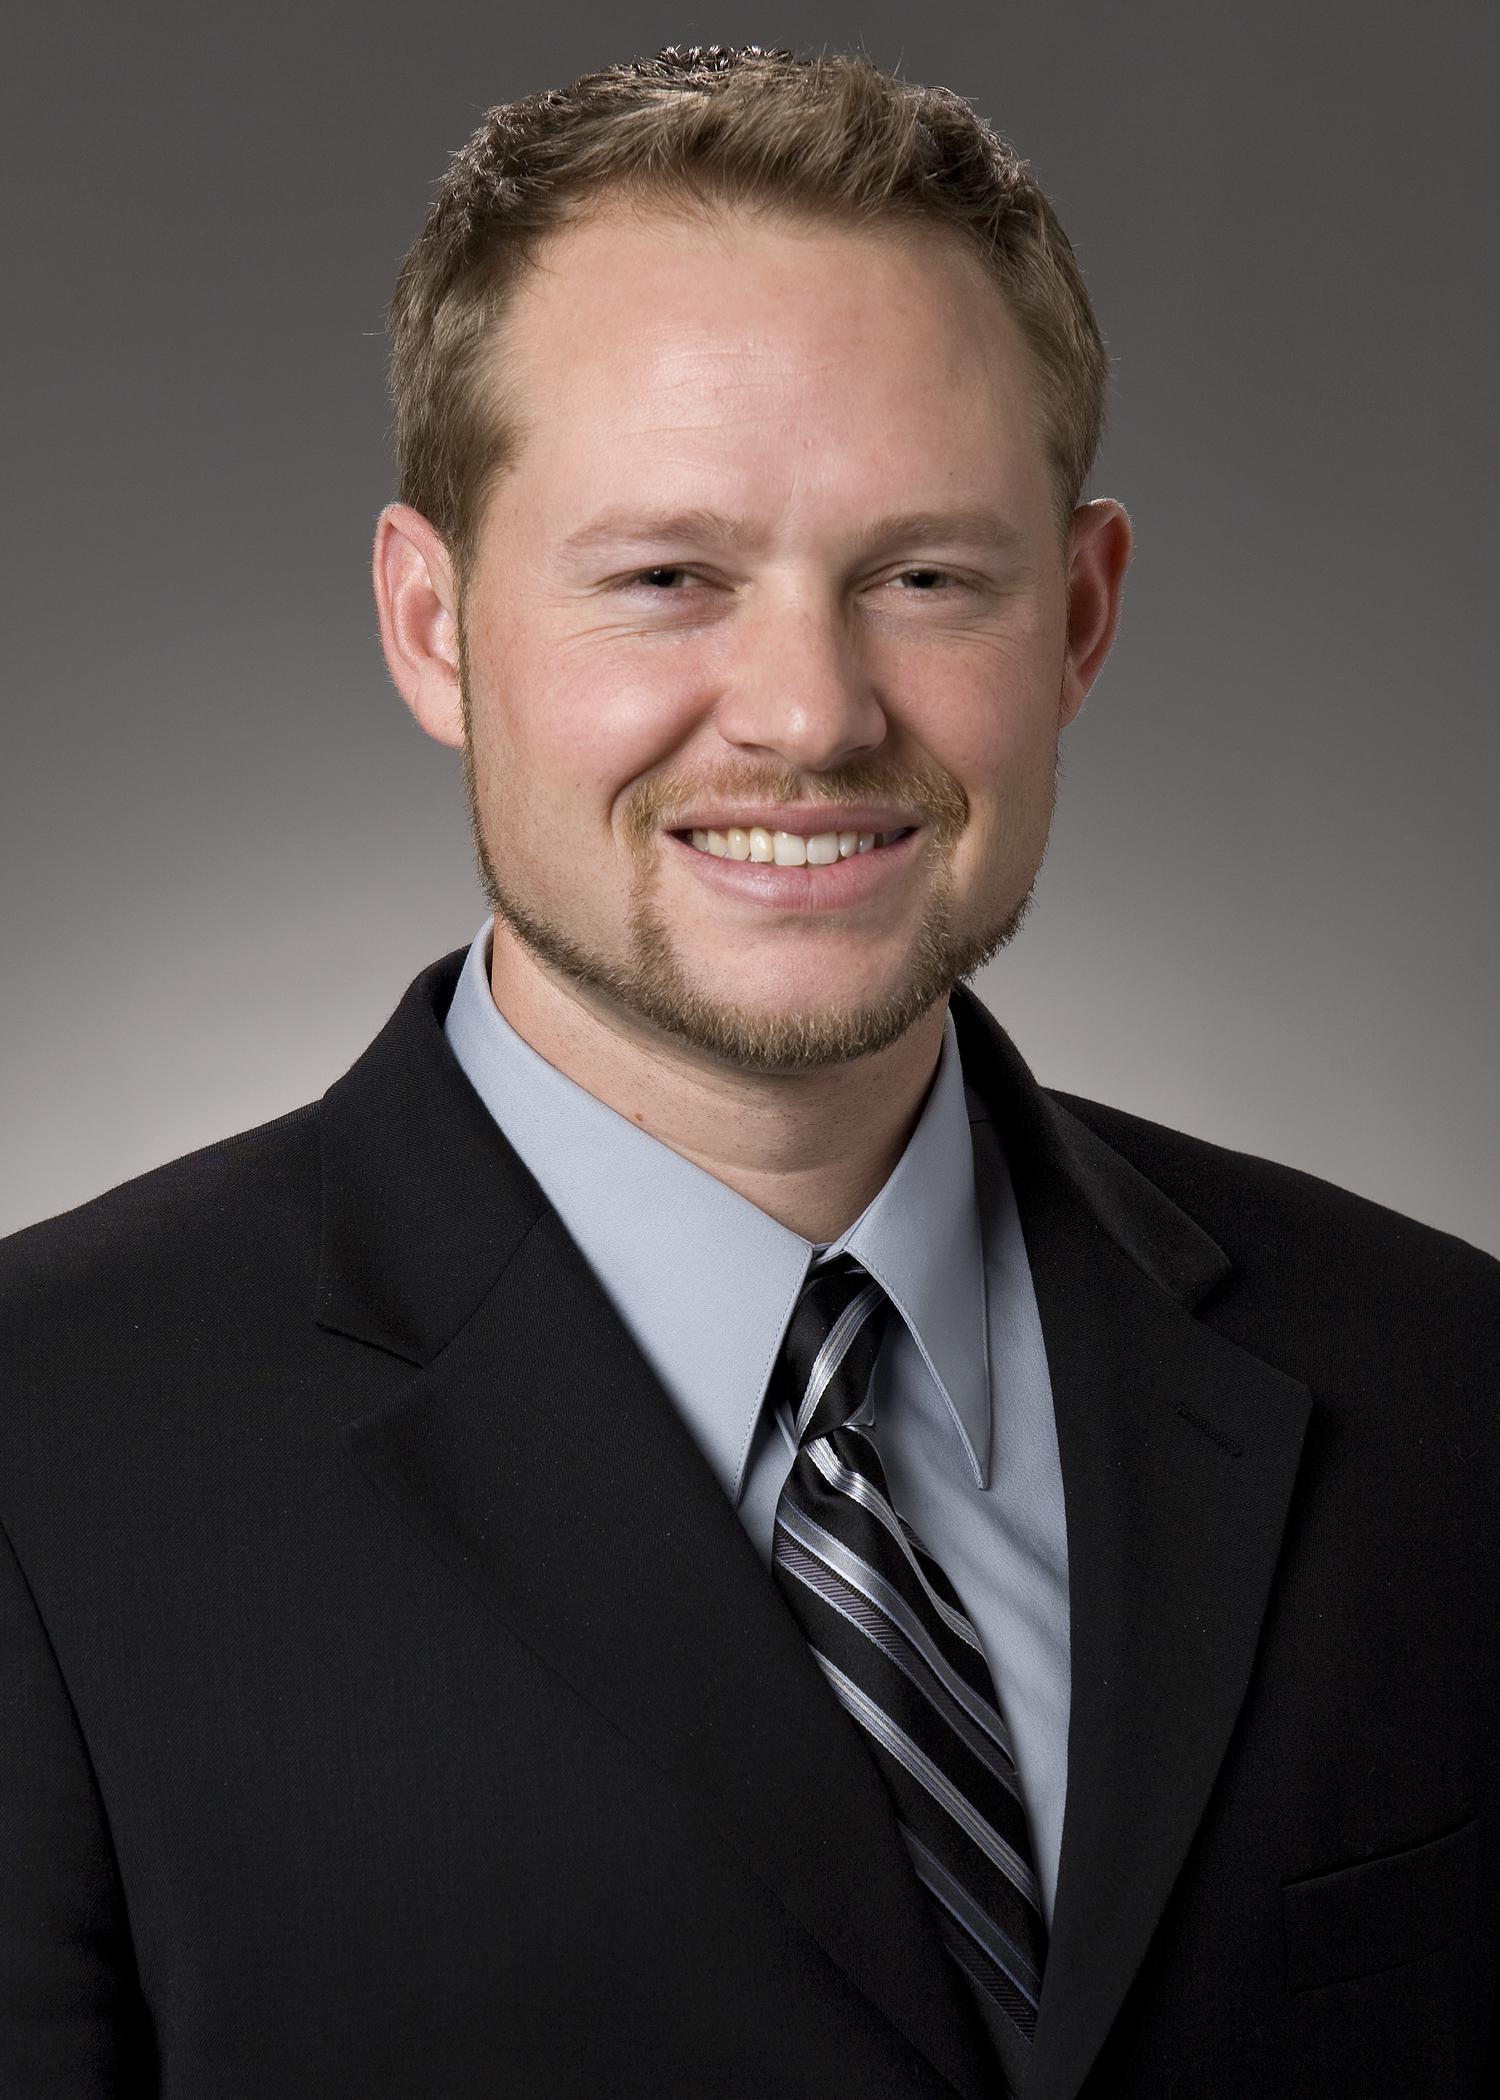 Sam Sady - State Farm Insurance Agent | 16100 NW Cornell Rd Ste 280, Beaverton, OR, 97006 | +1 (503) 208-7474